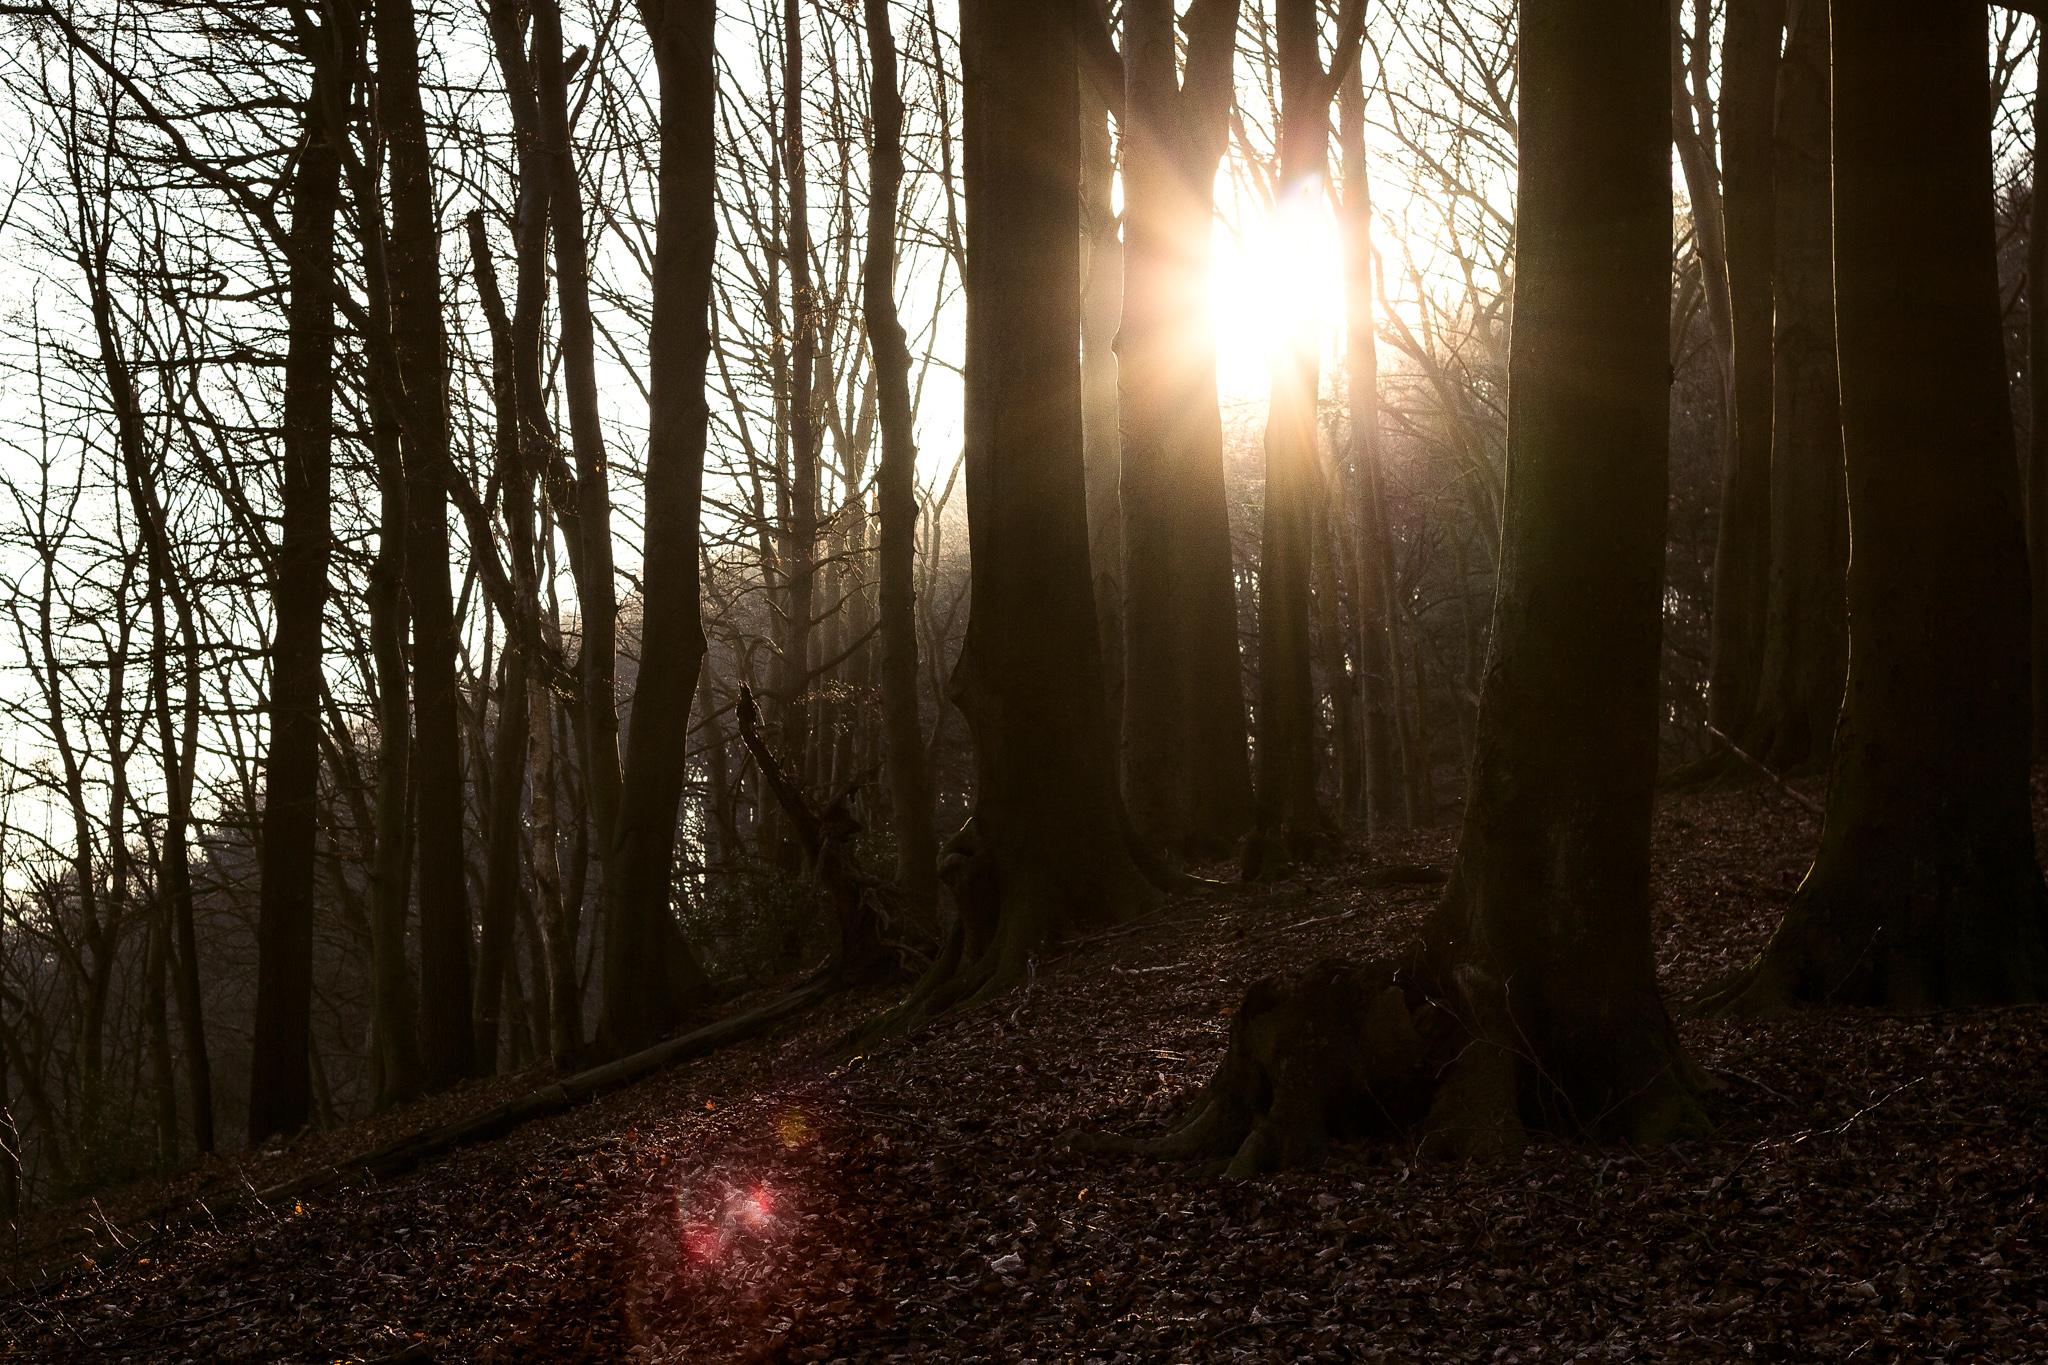 -north-rhine-westphalia-best-nature-walks-2.jpg